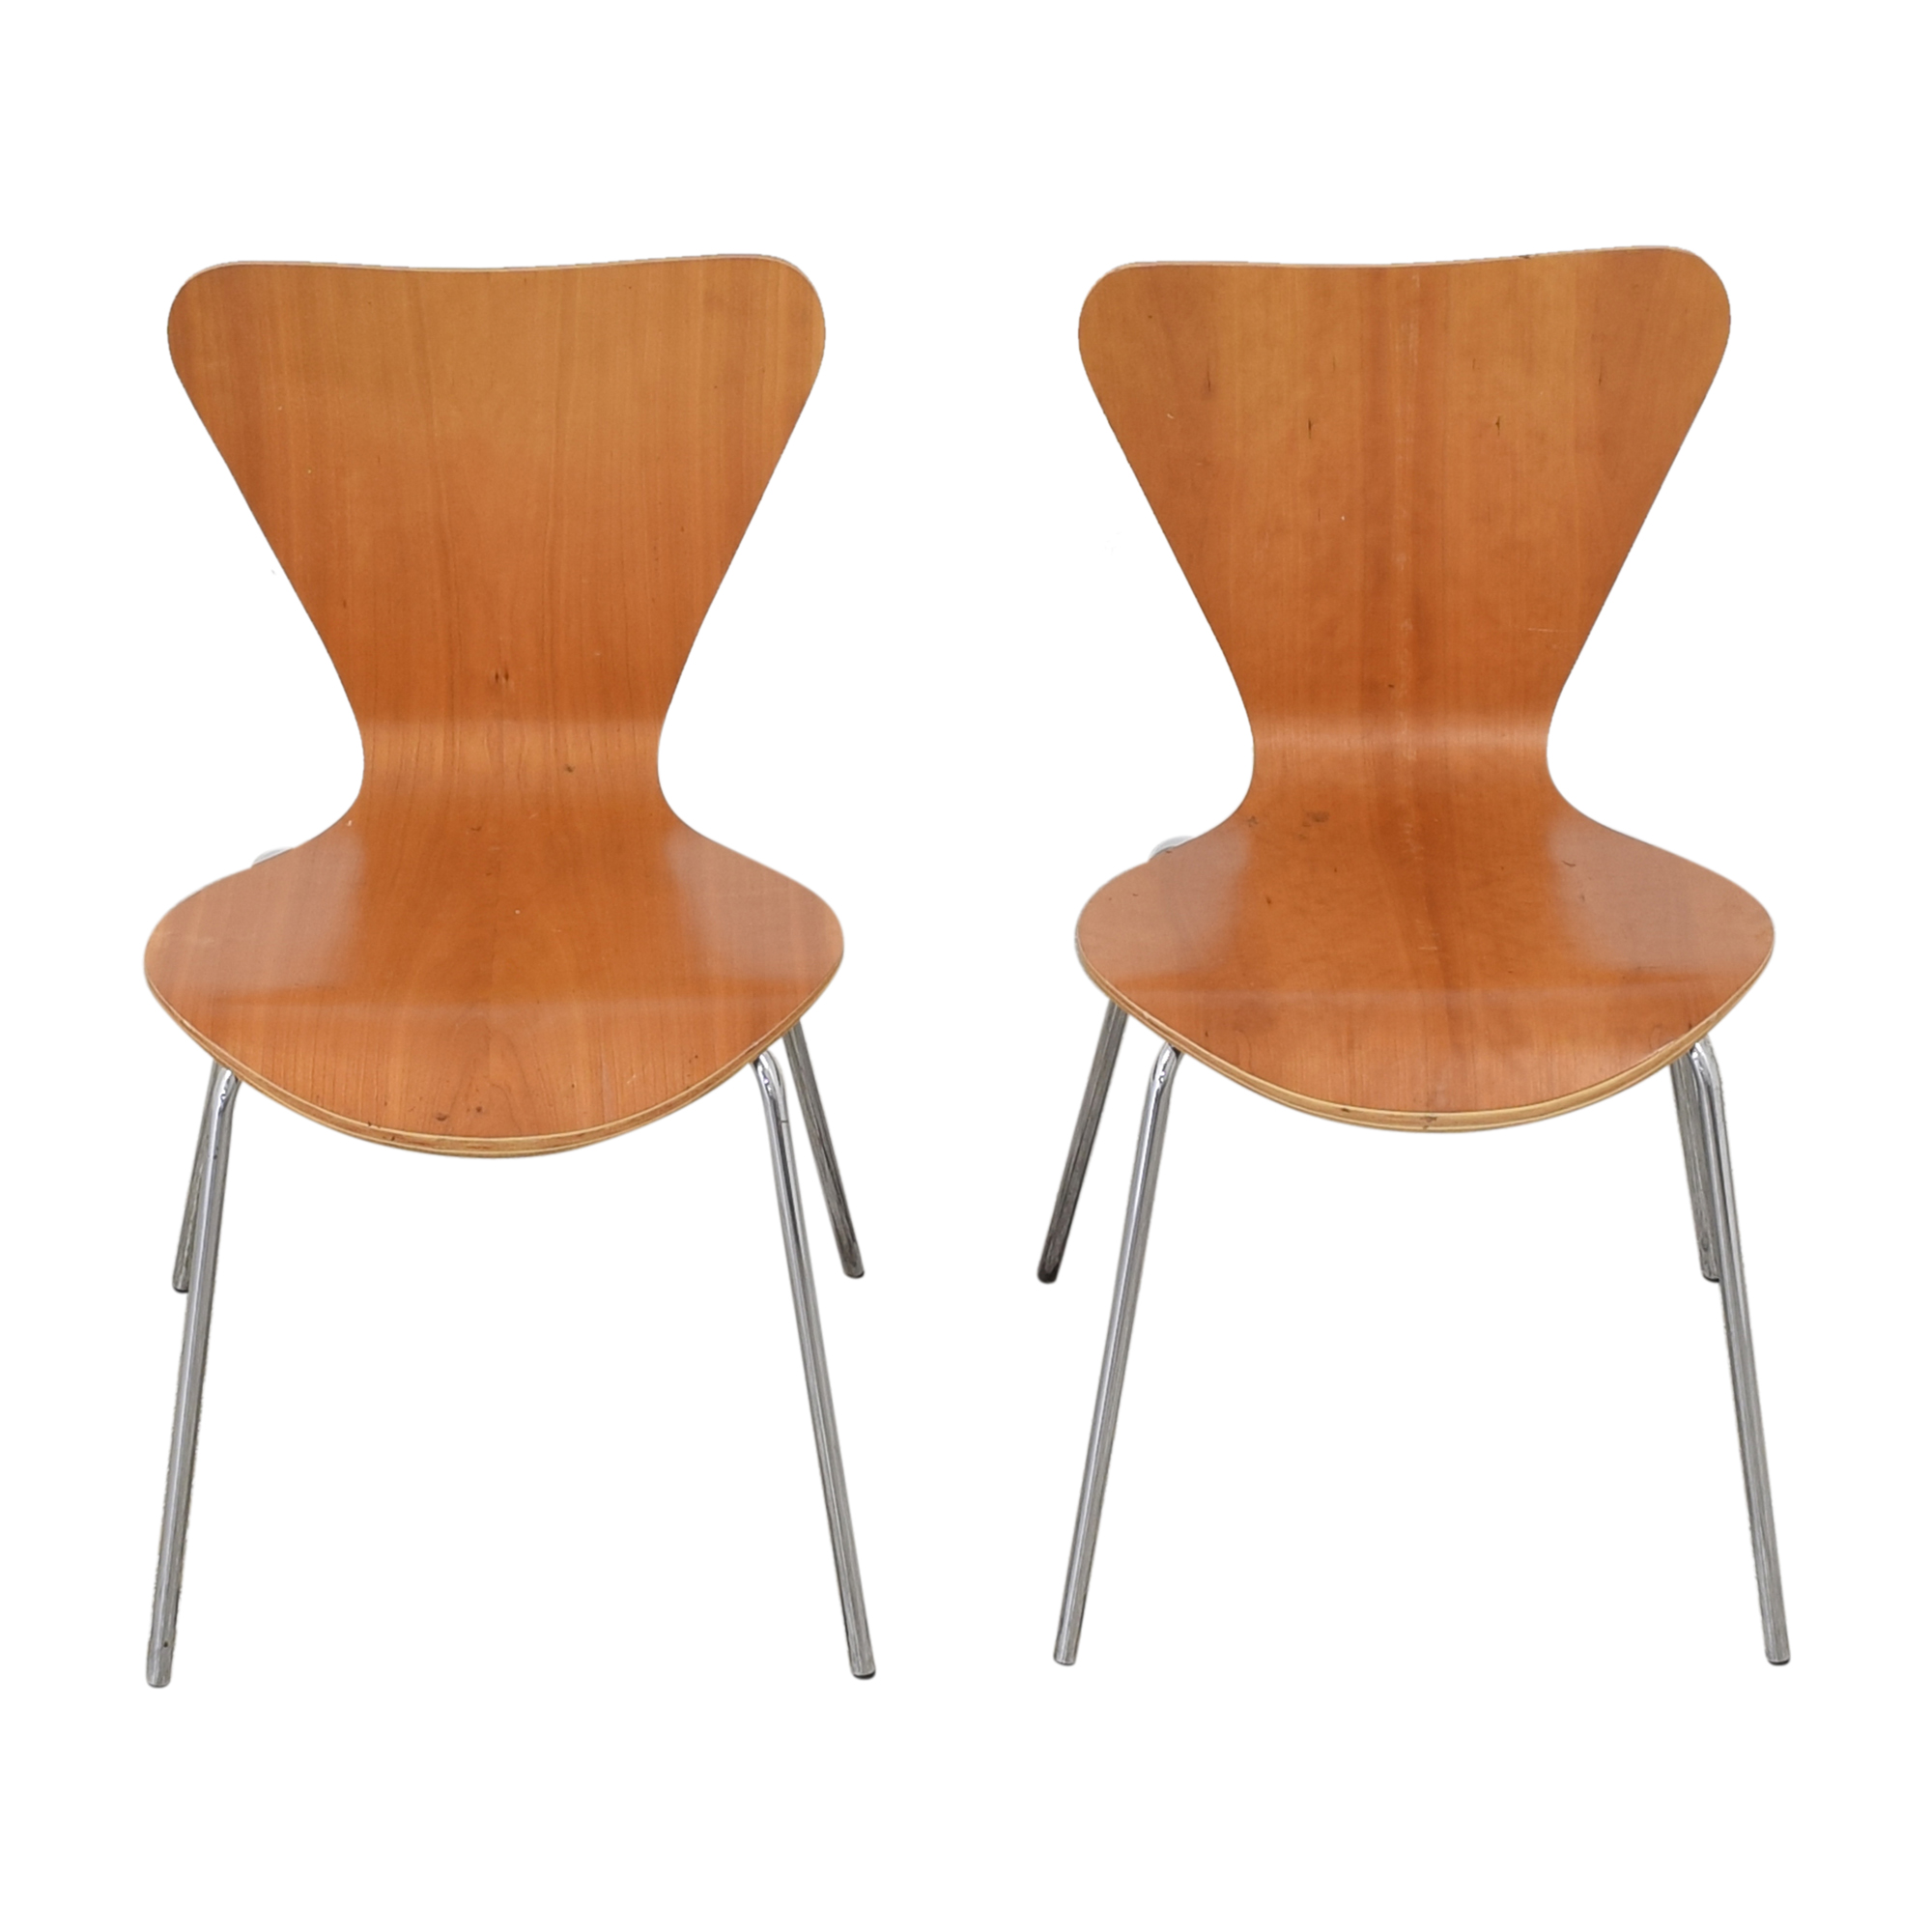 Room & Board Room & Board Jake Dining Chairs pa